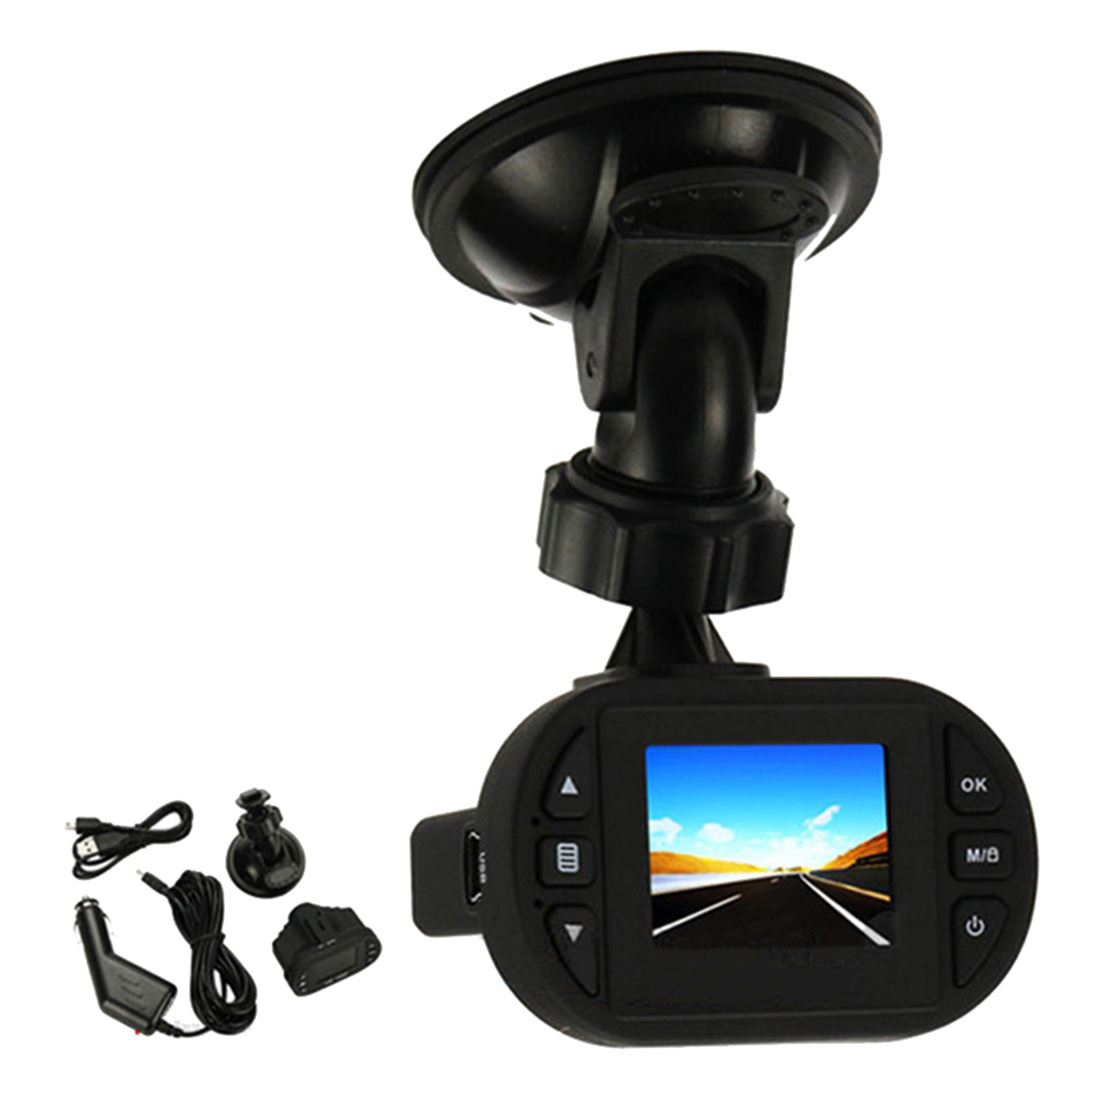 HD 1.5 Full 1080P LCD Car DVR Vehicle Camera Video Recorder Dash Cam G-sensor